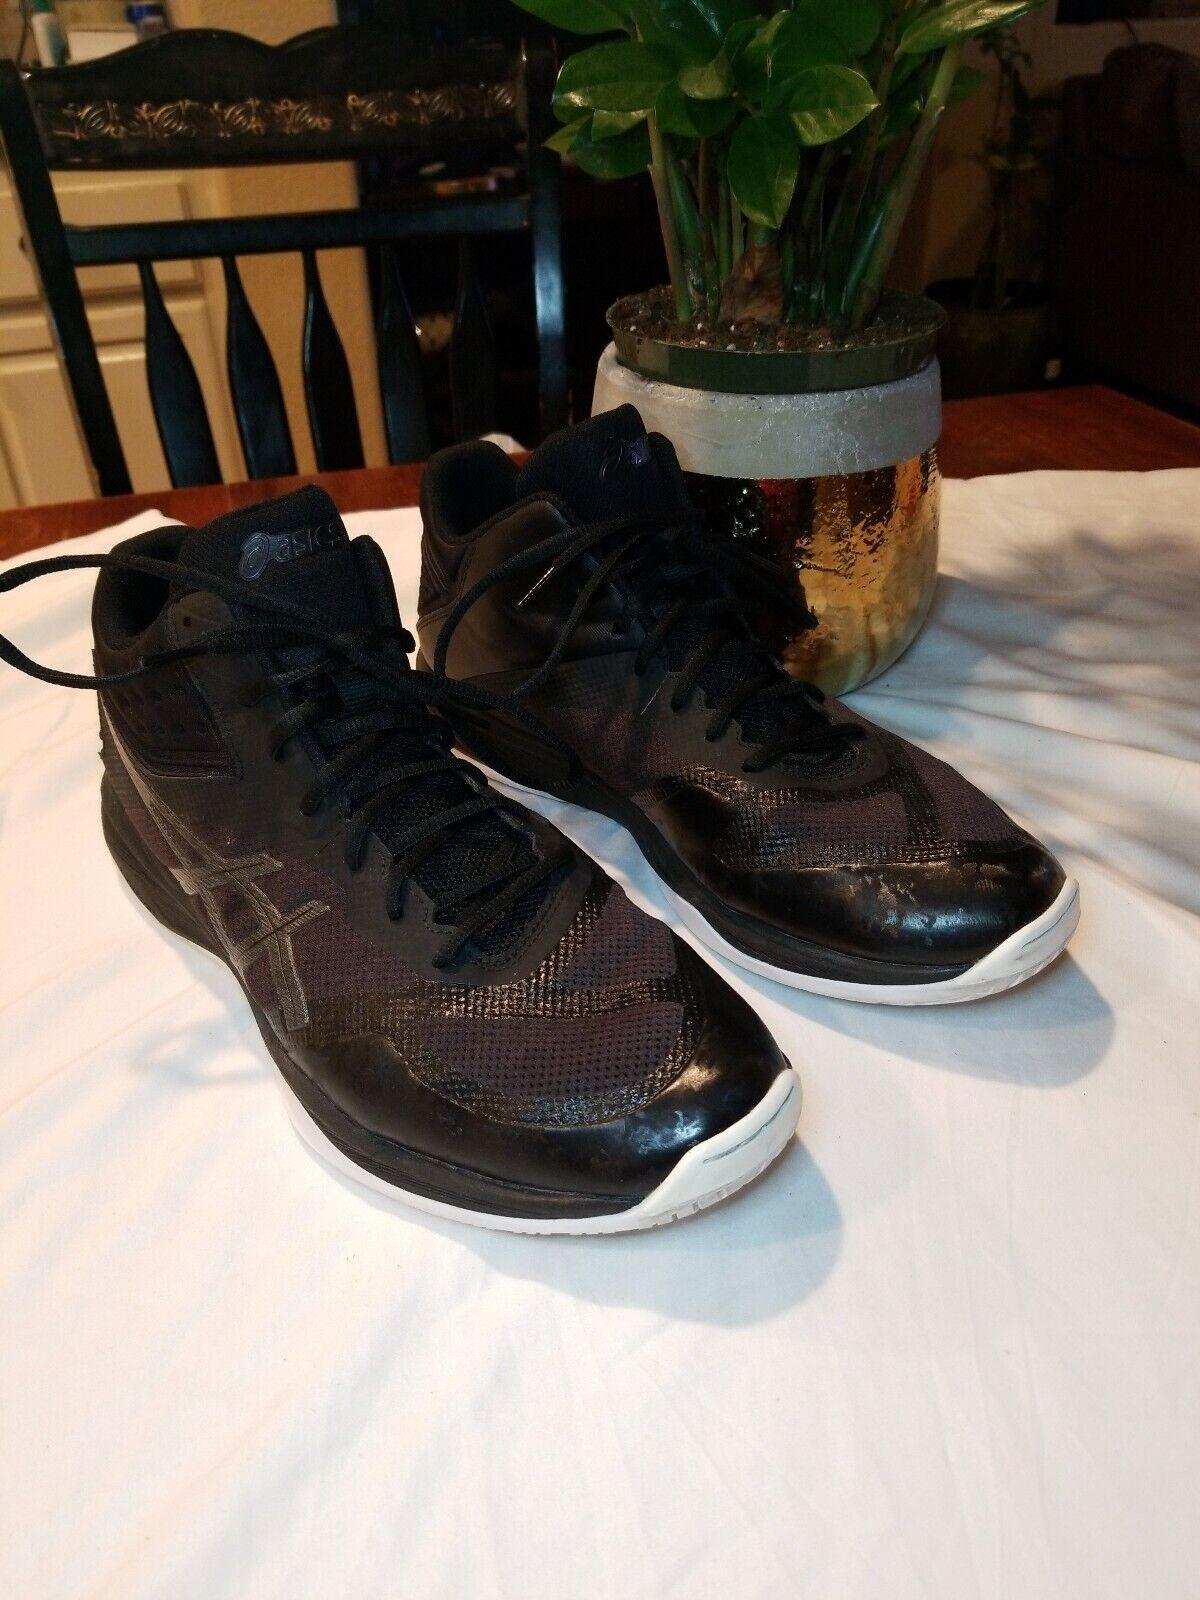 Asics NETBURNER BALLISTIC FF MT Black Men Volleyball shoes Size 14 1051A003-001